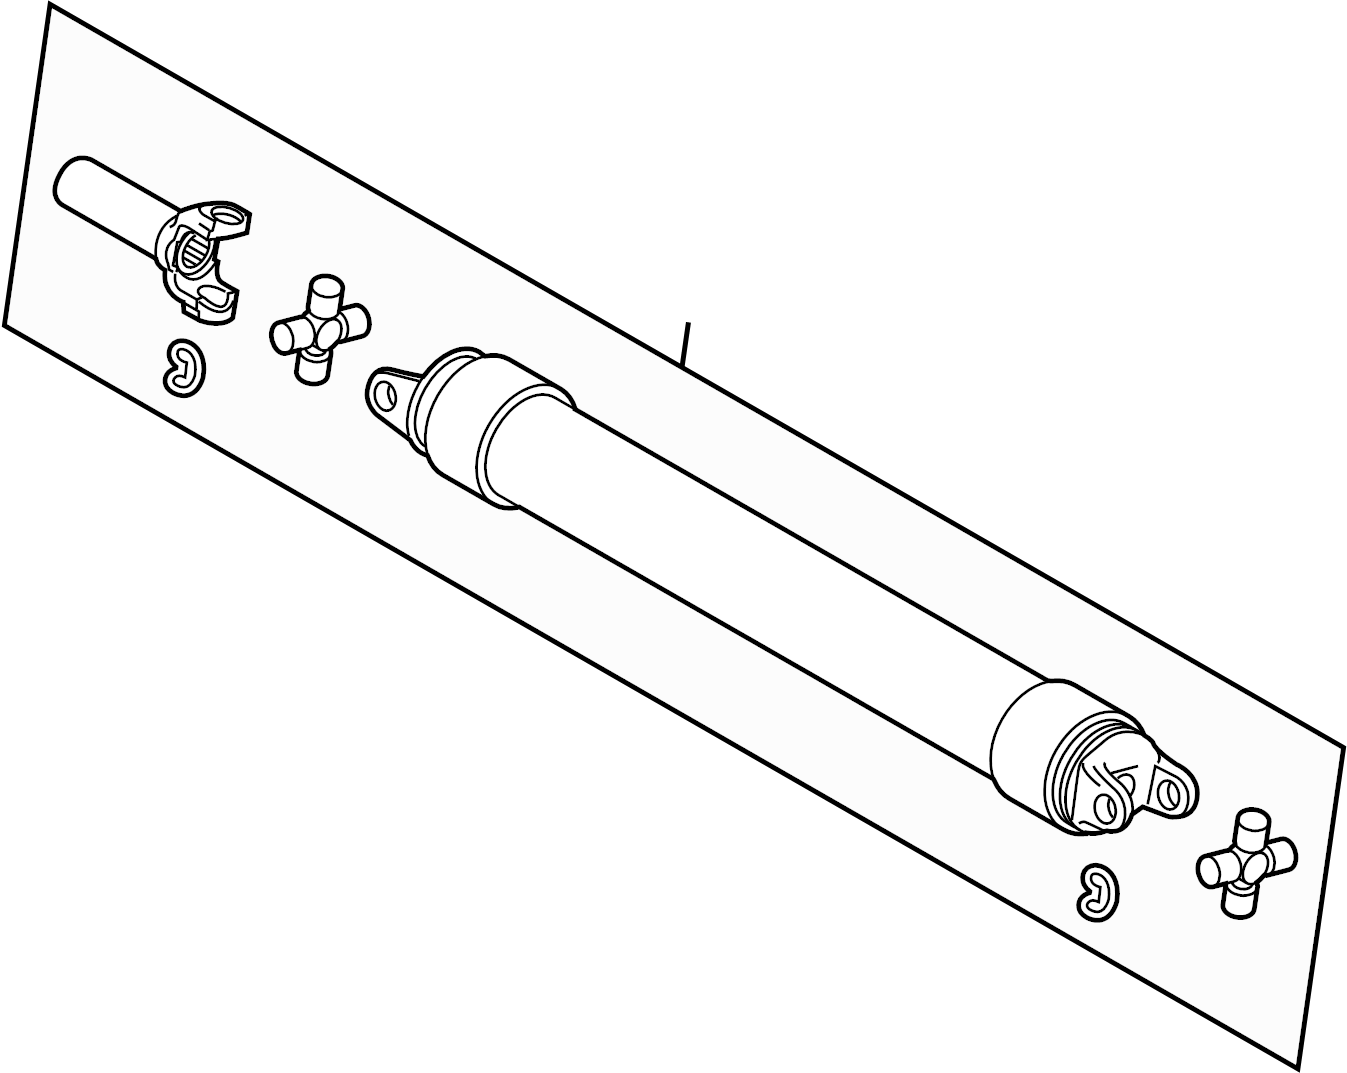 [DIAGRAM] 2007 Gmc Yukon Suspension Diagram FULL Version